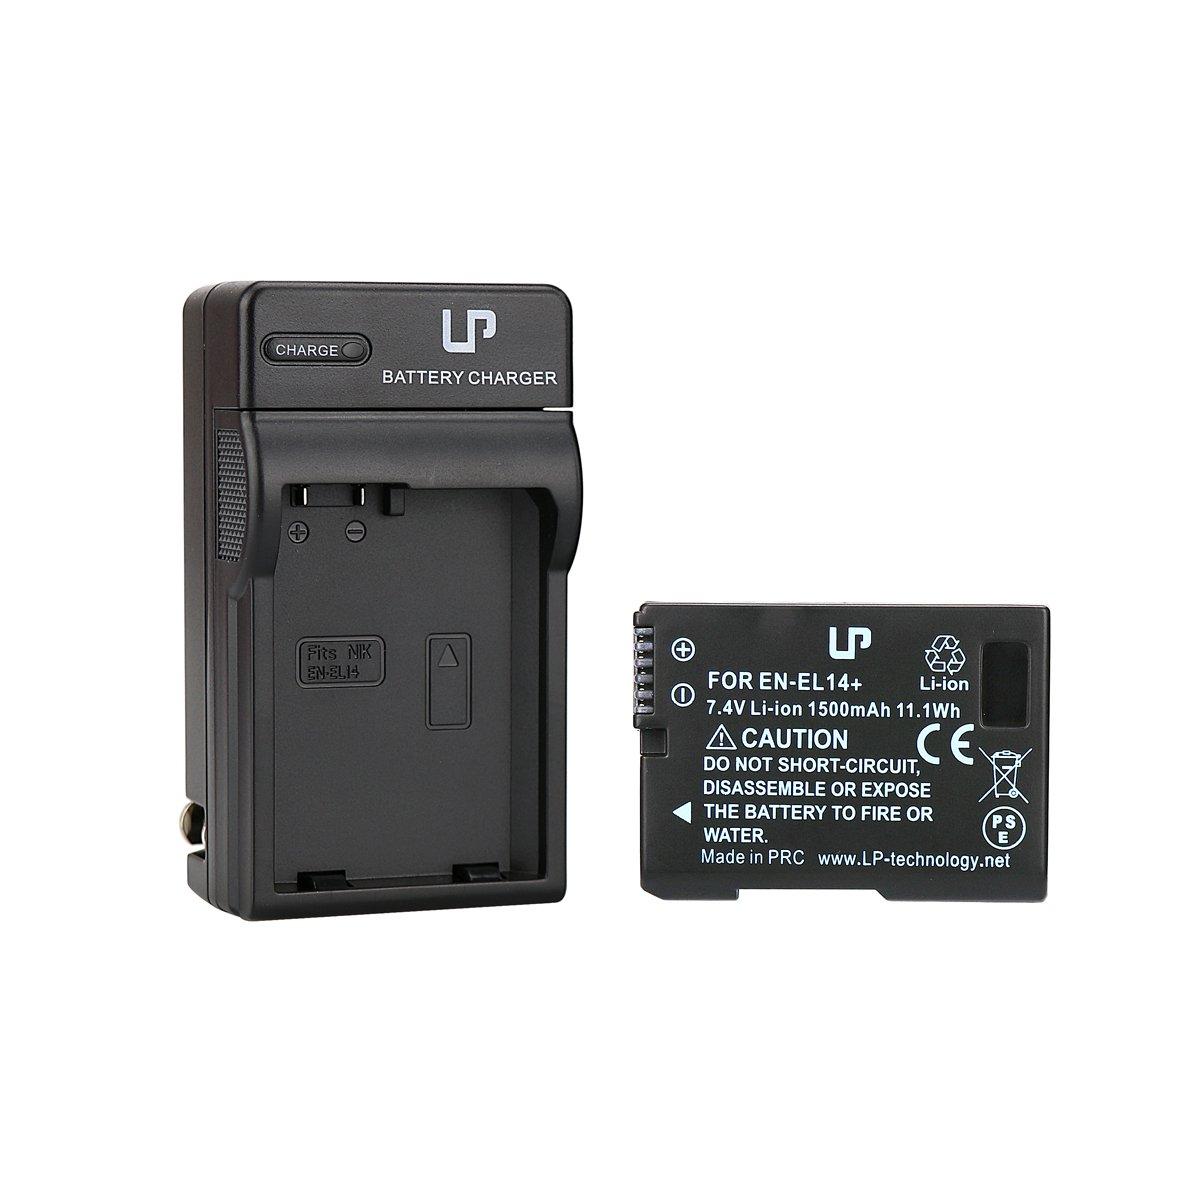 EN-EL14 Battery and Charger for Nikon D3100, D3200, D3300, D5100, D5200, D5300, D5500, DF, Coolpix P7000, P7100, P7700, P7800 Cameras